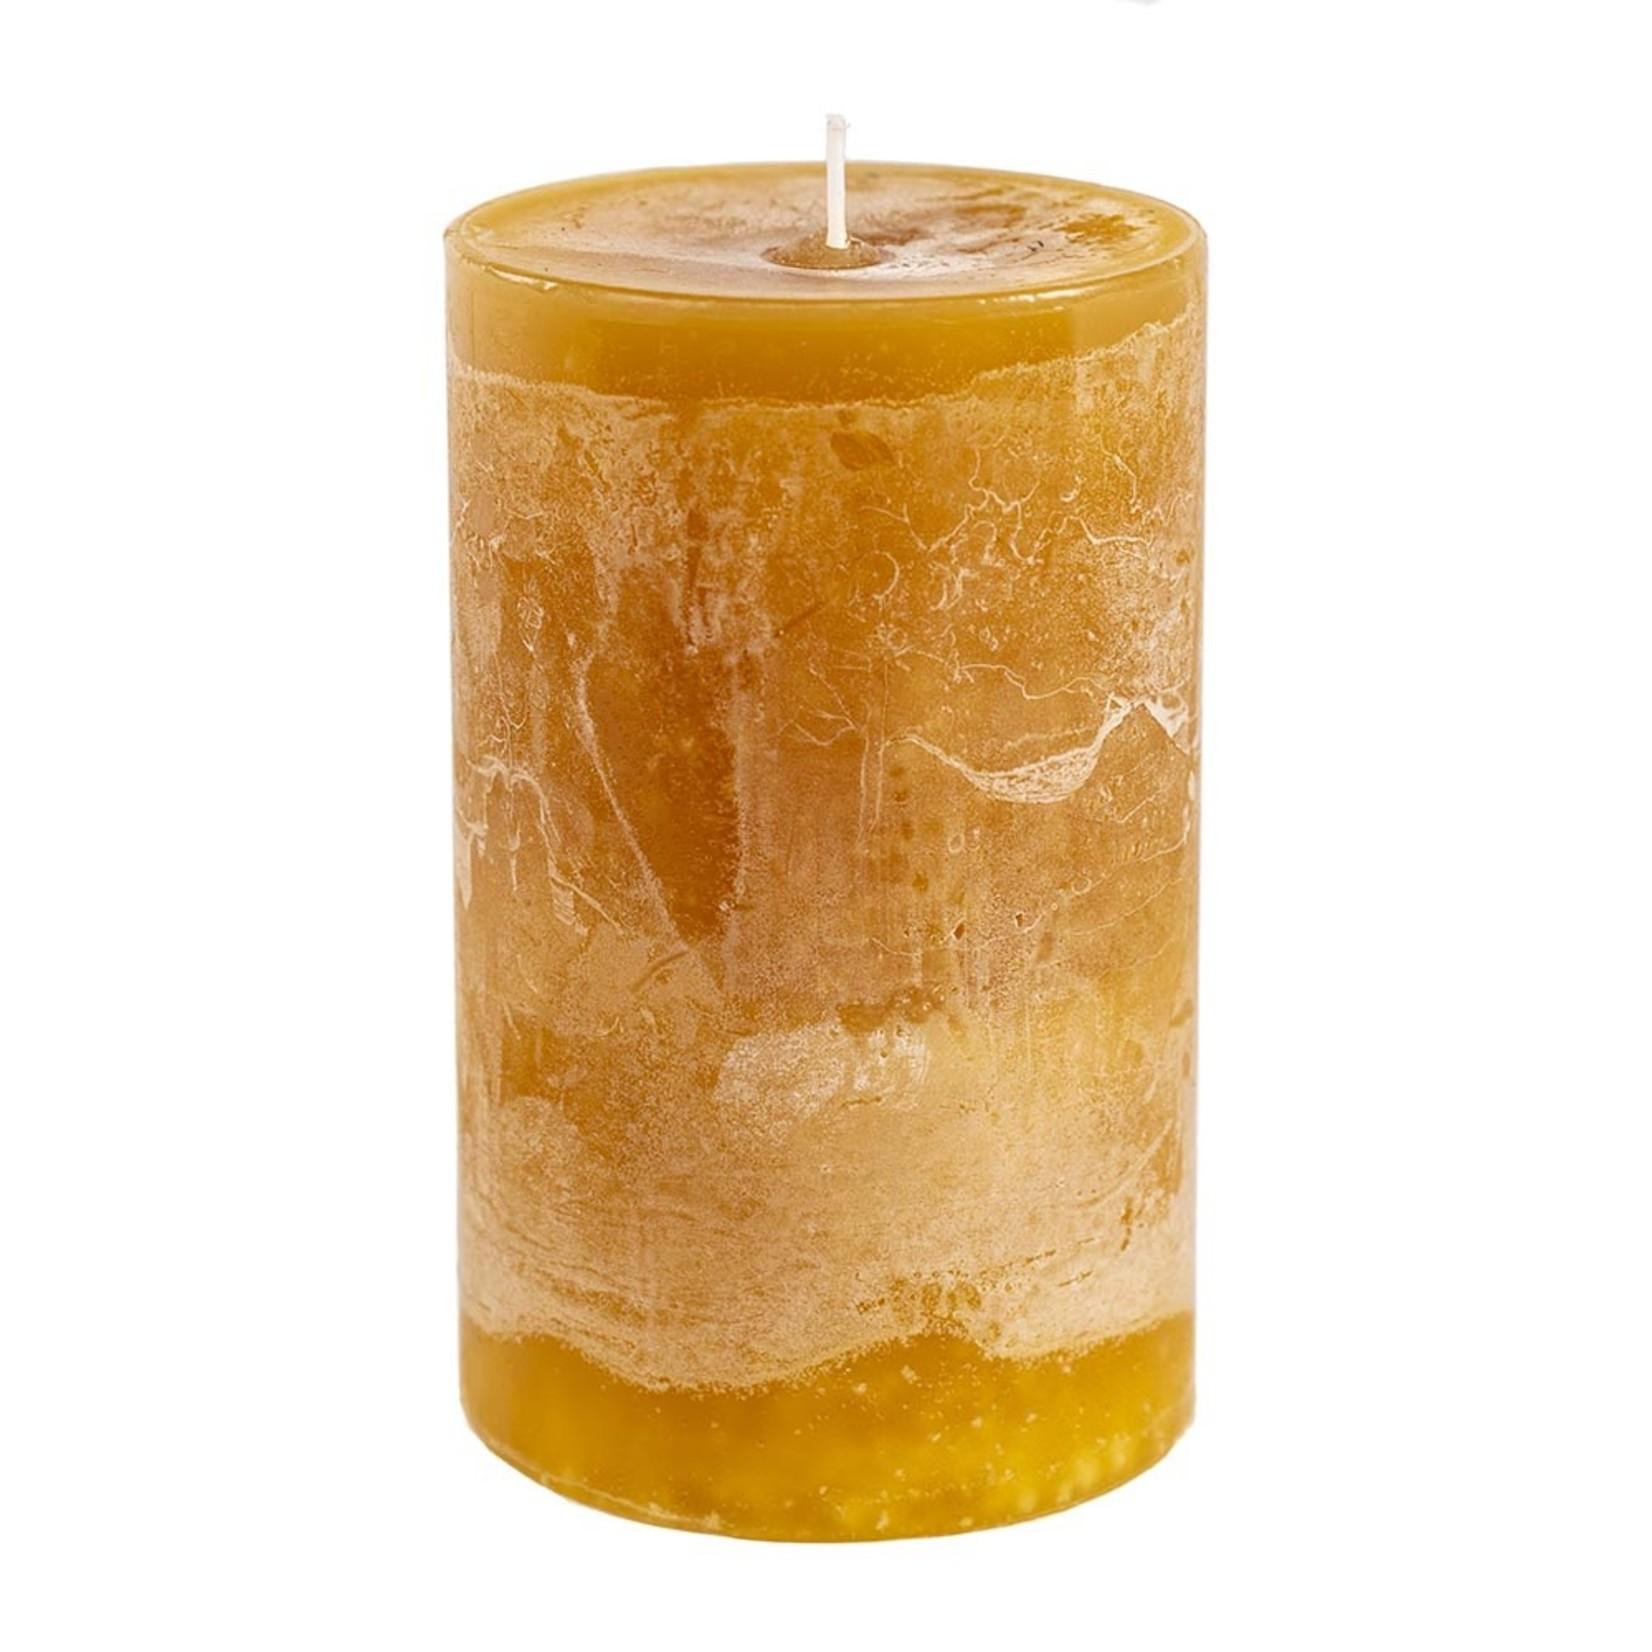 Home Society Pillar Candle 9x15cm Yellow